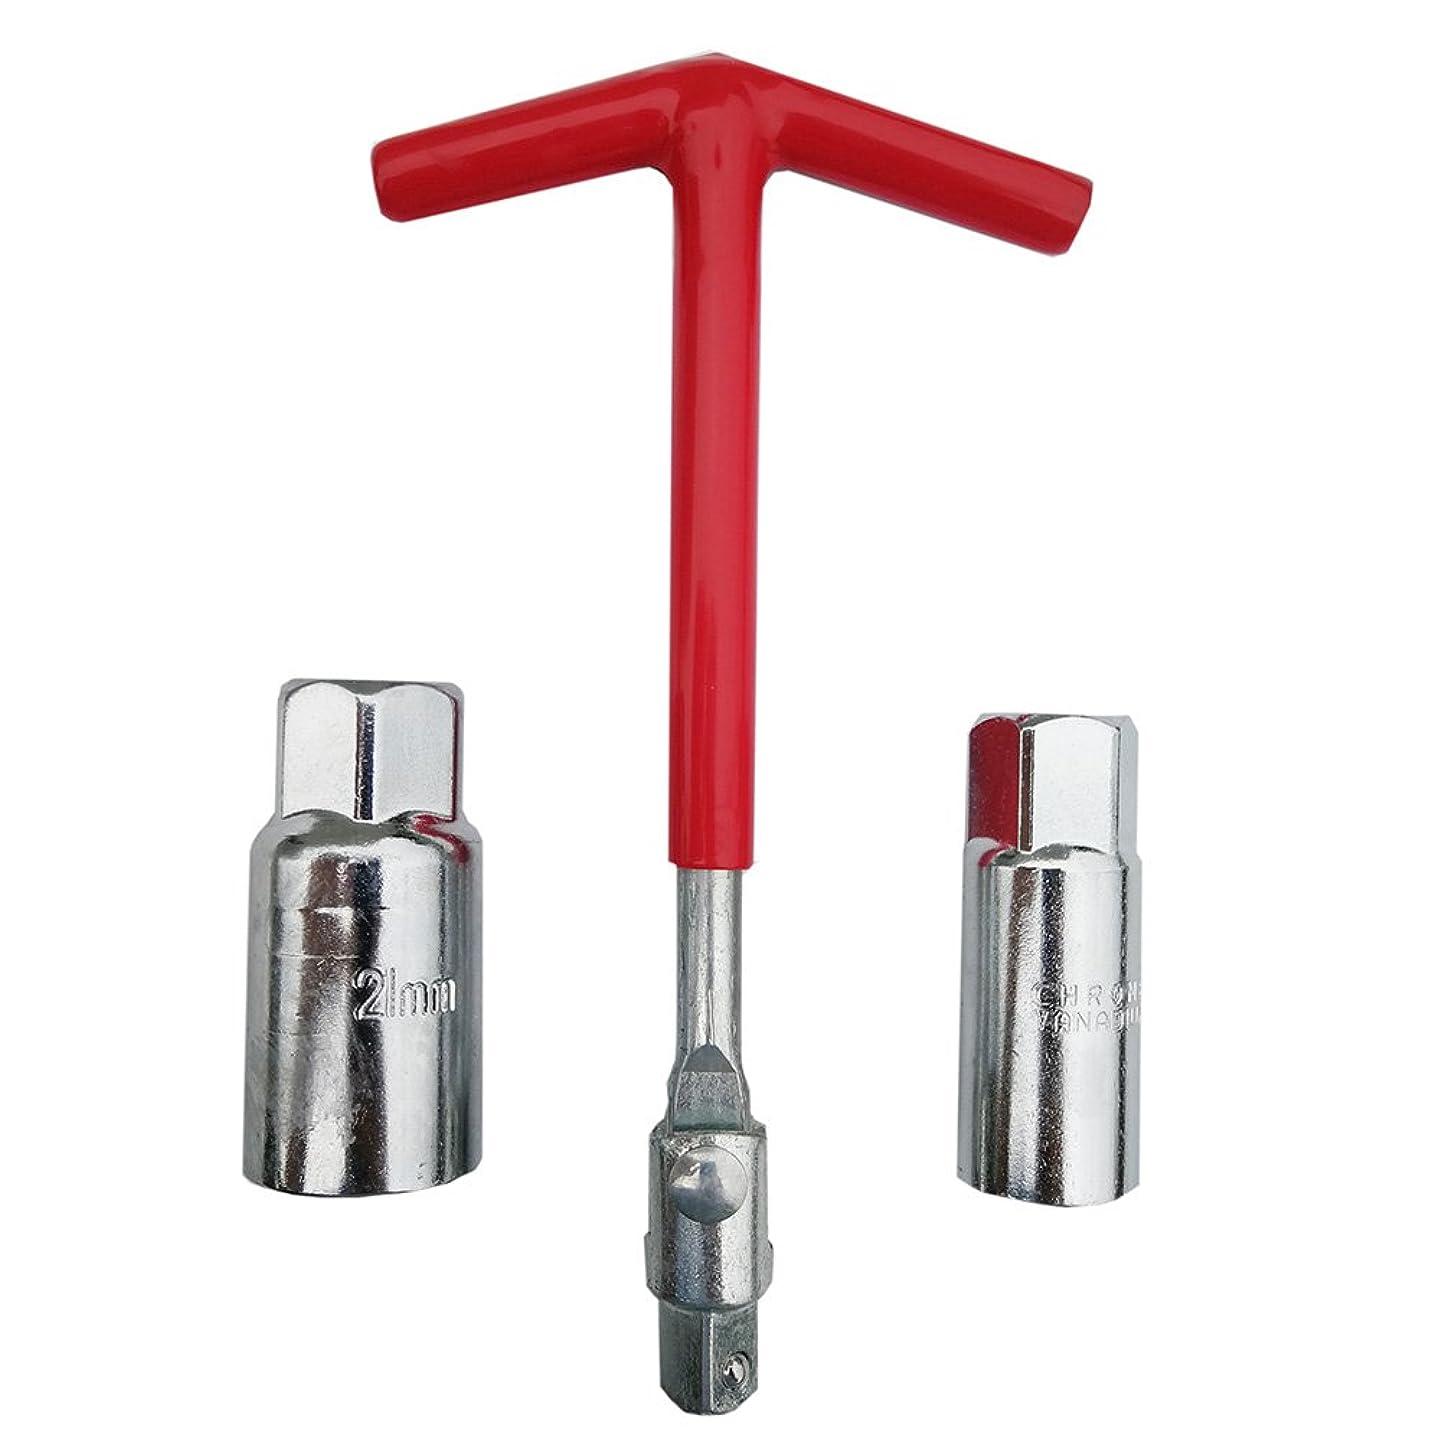 Hetai T-handle Universal Joint Spark Plug Remover Installer Set 5/8